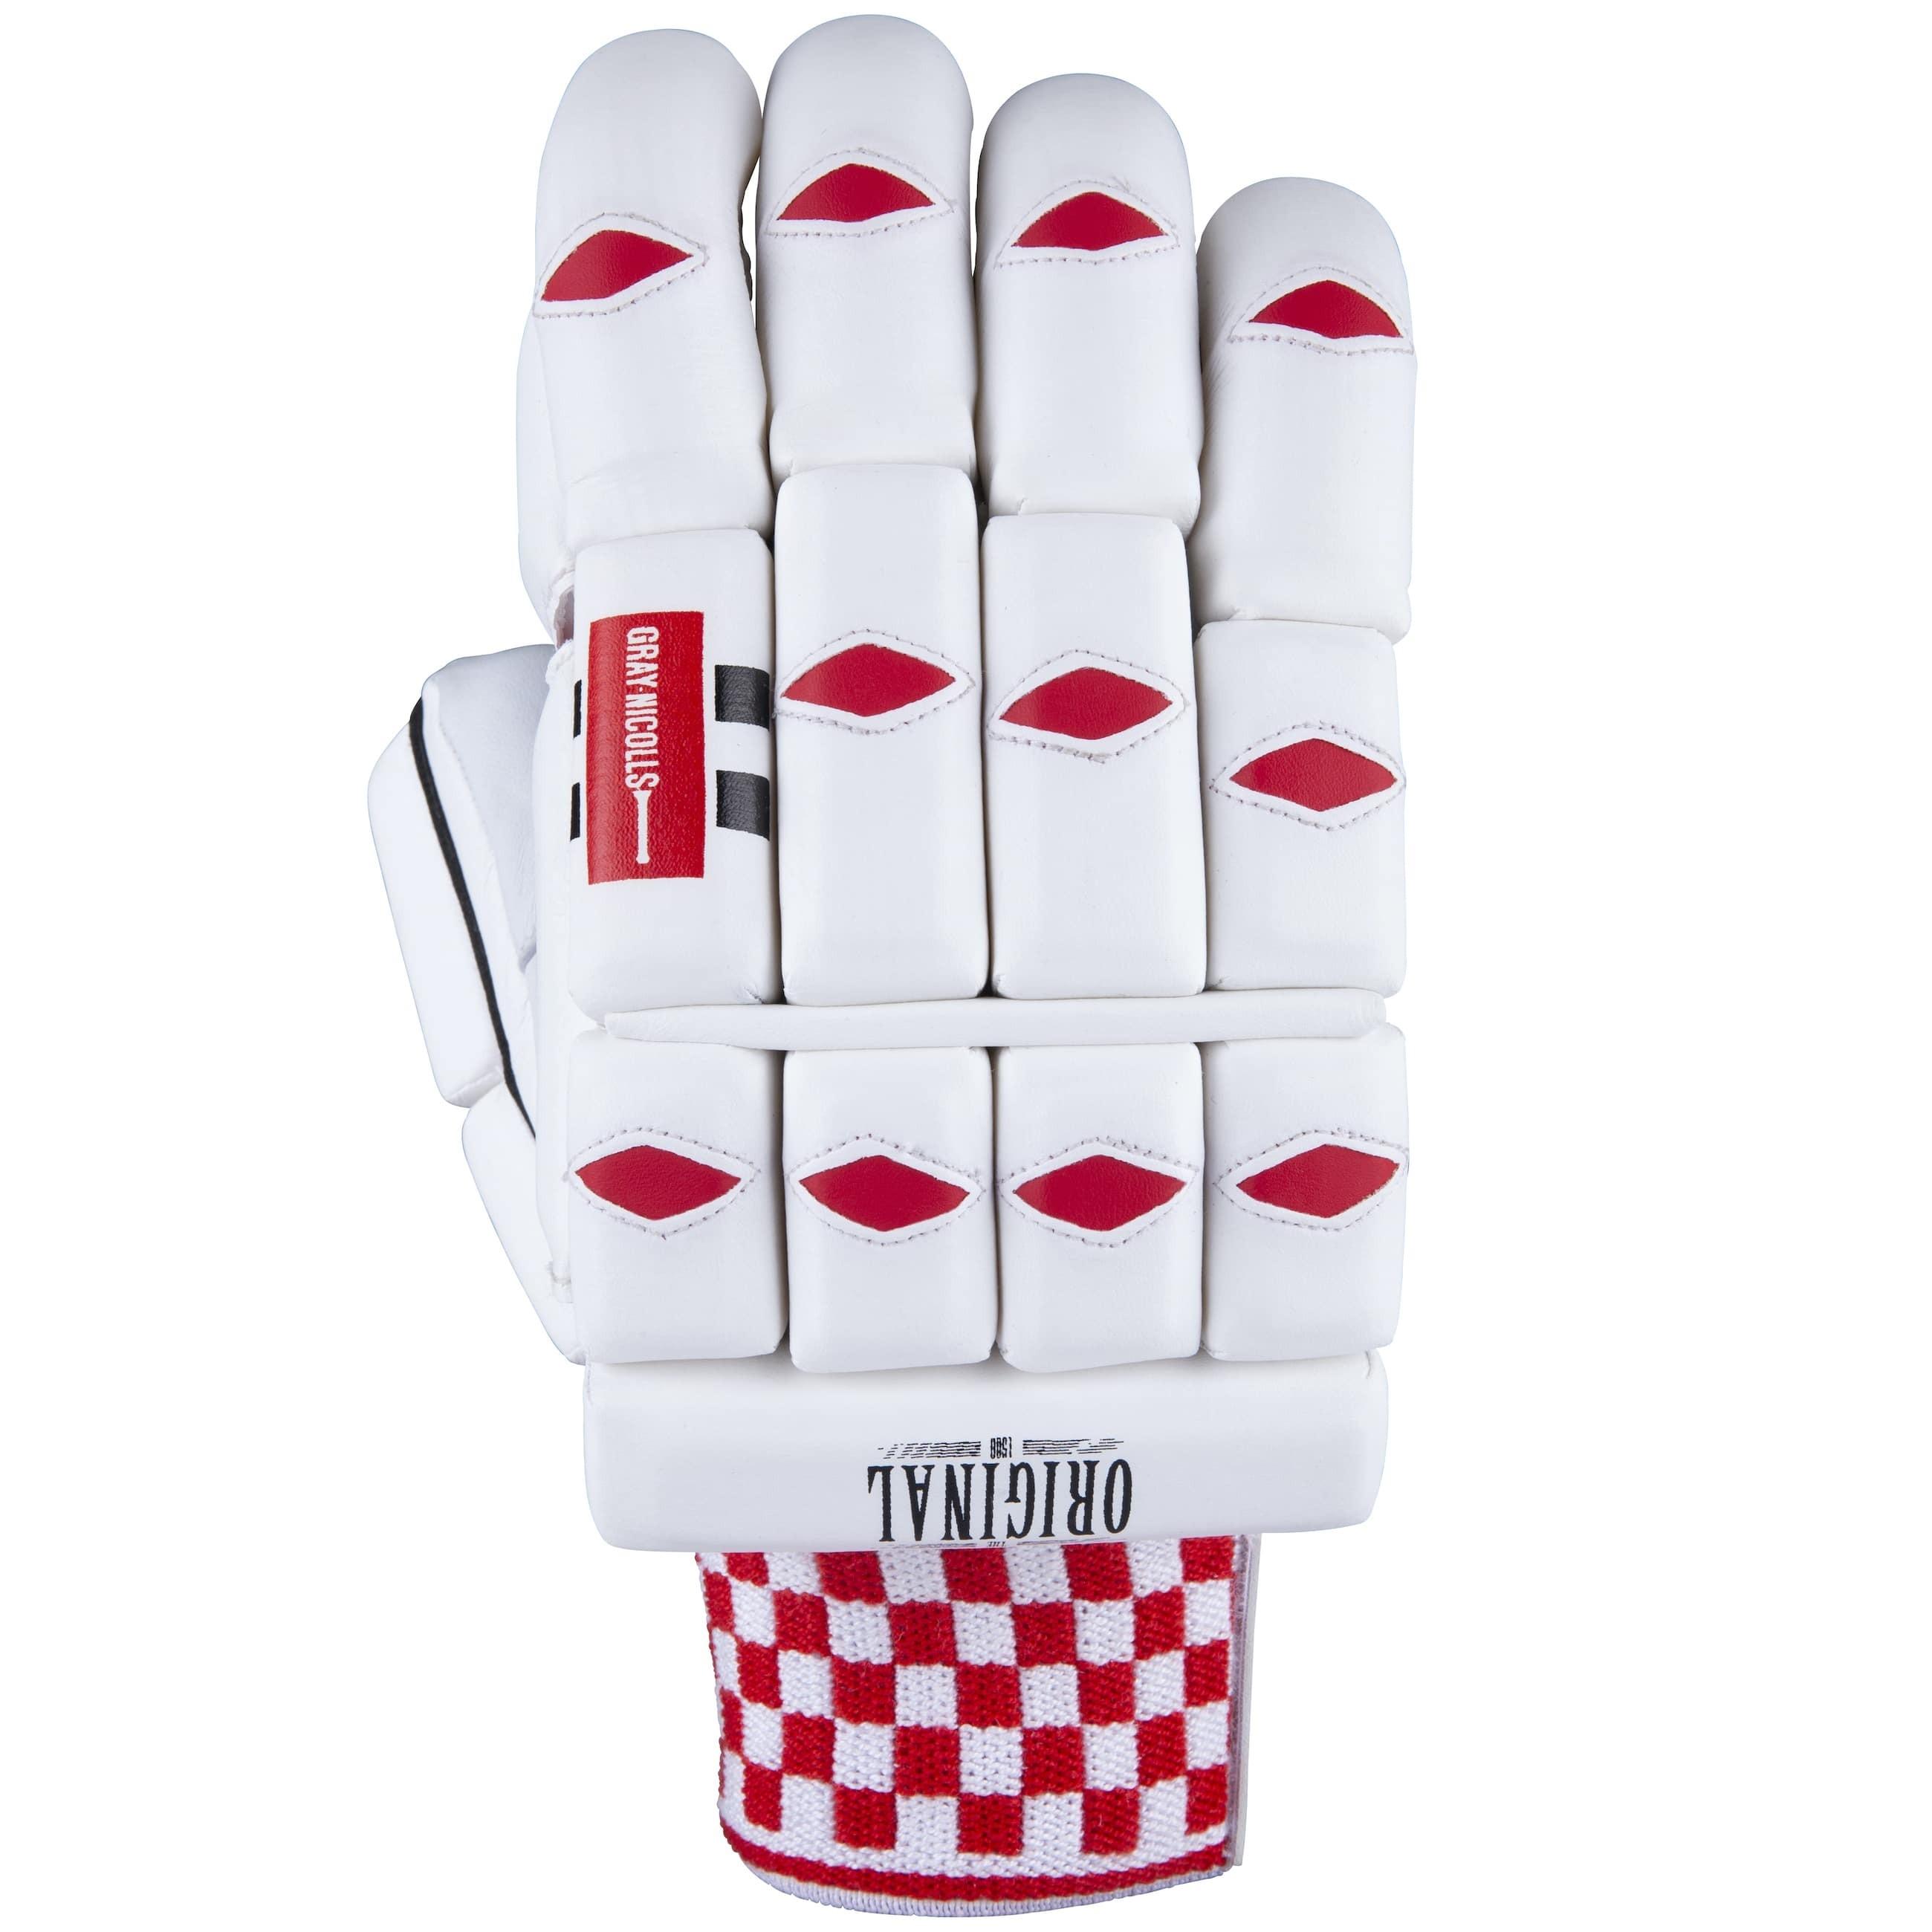 2021 Gray Nicolls Original Test 1500 Batting Gloves